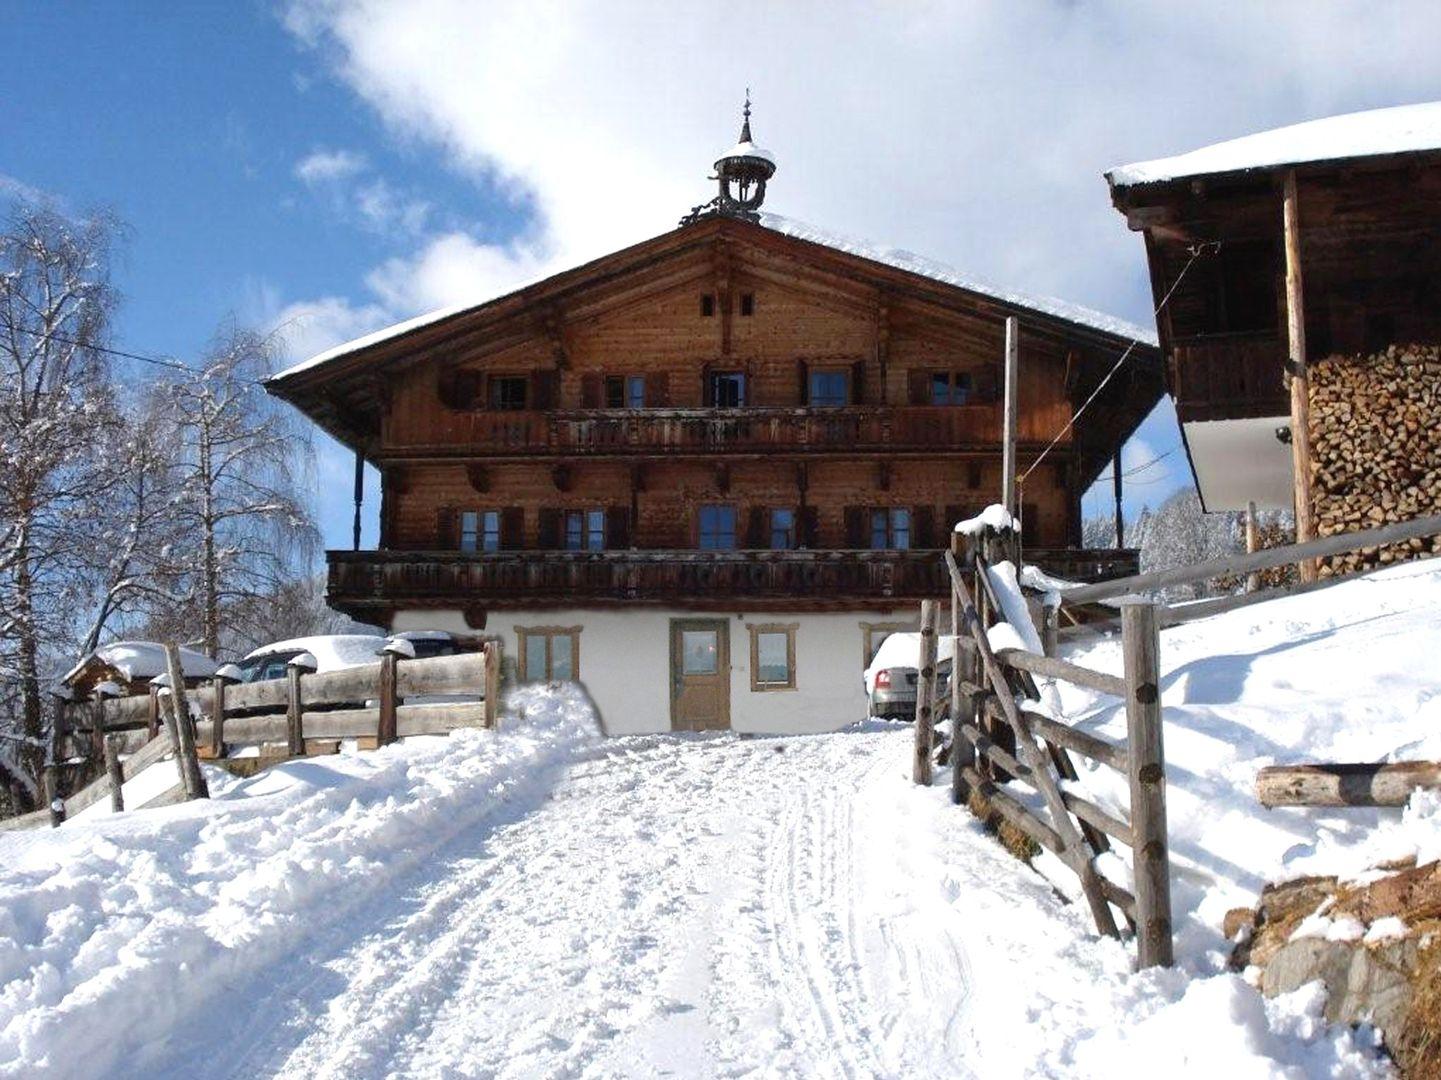 Gästehaus Ottenhof